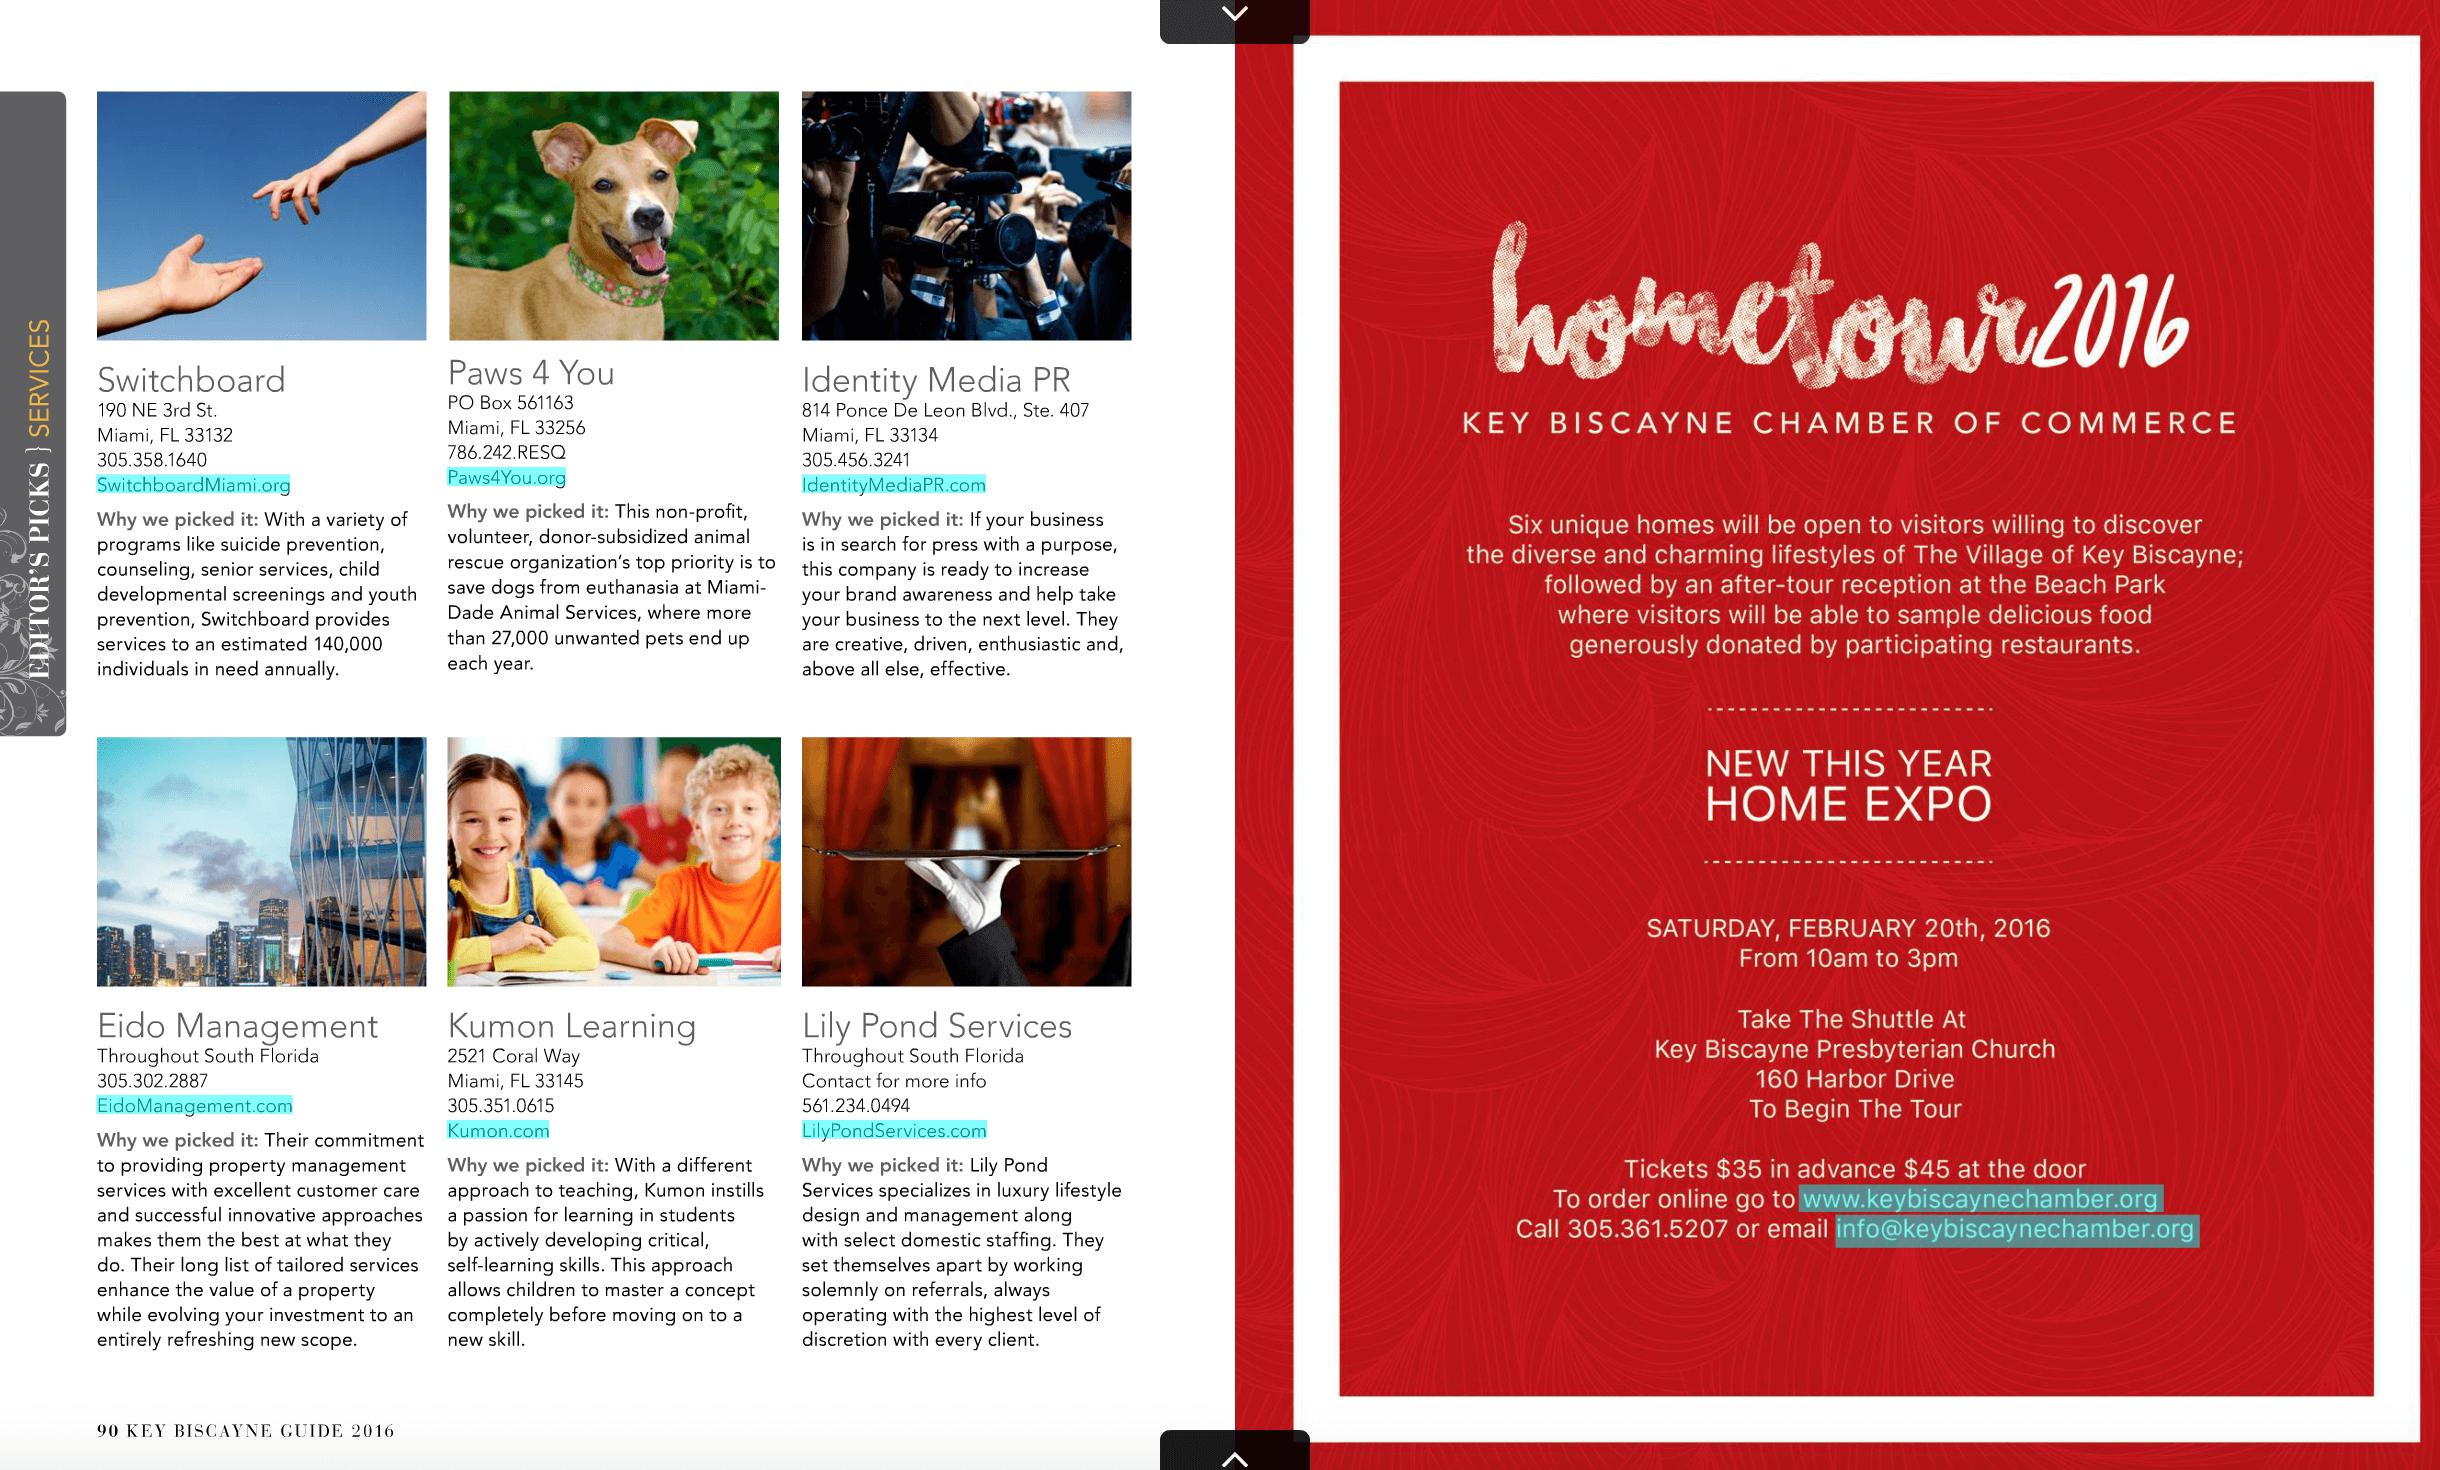 Key Biscayne Page 2